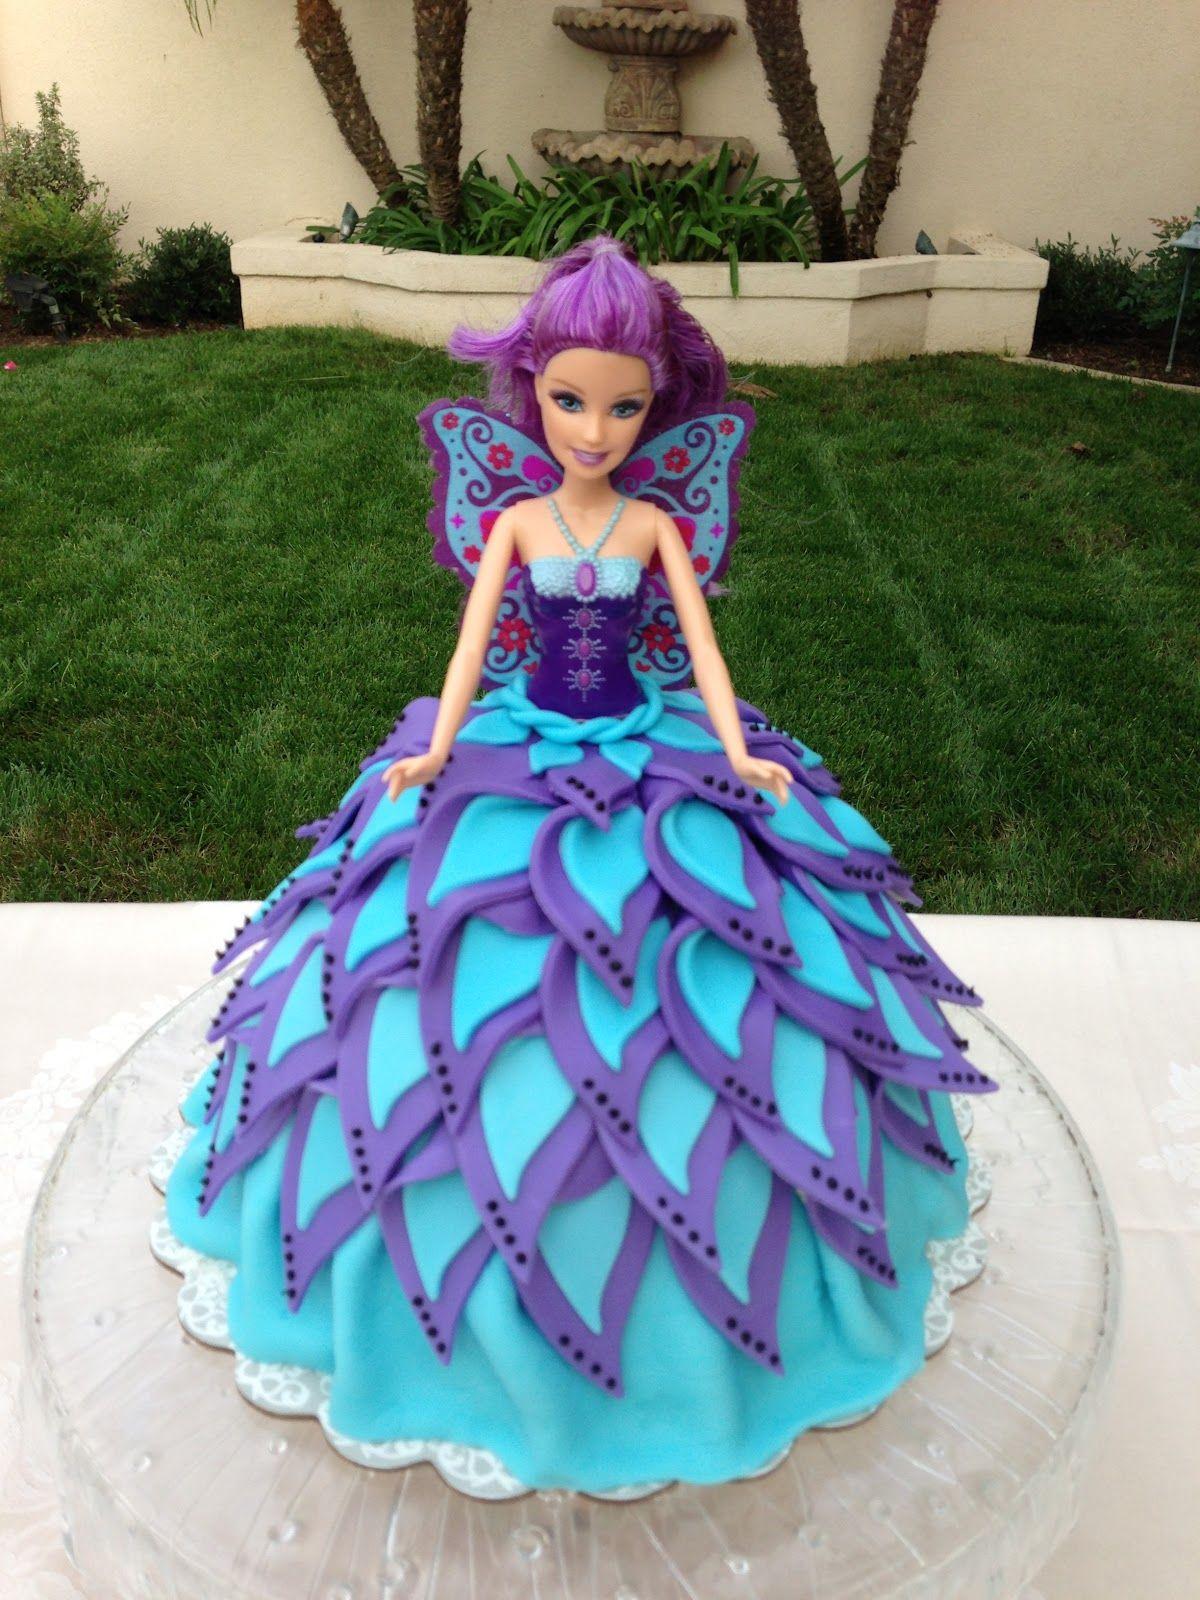 Fairy Cake Enchanted Garden Birthday Pinterest Cake Birthday